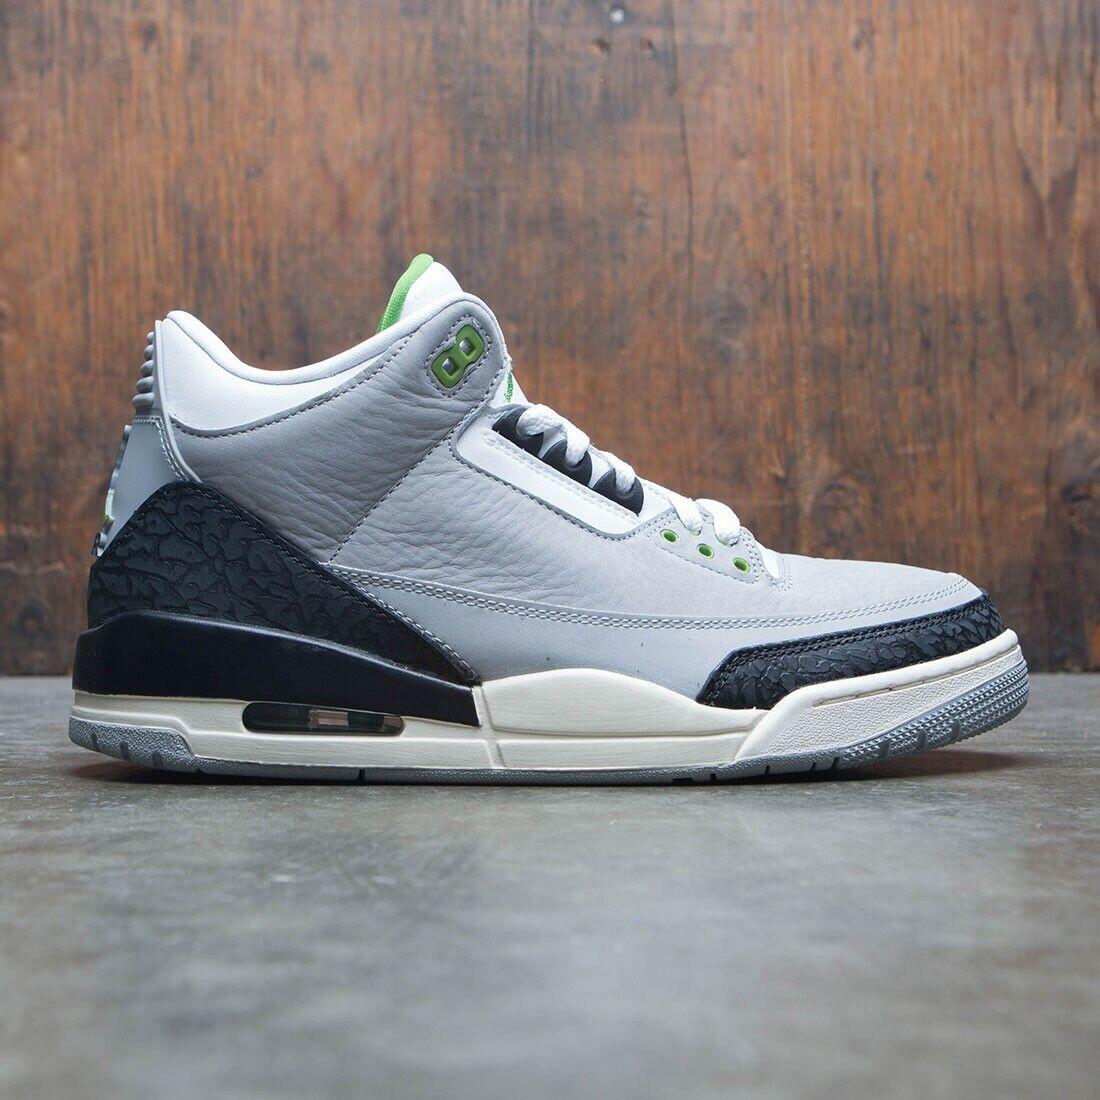 2018 Nike Air Jordan 3 Retro Chlgoldphyll Size Size Size 16. 136064-006 ae06f2